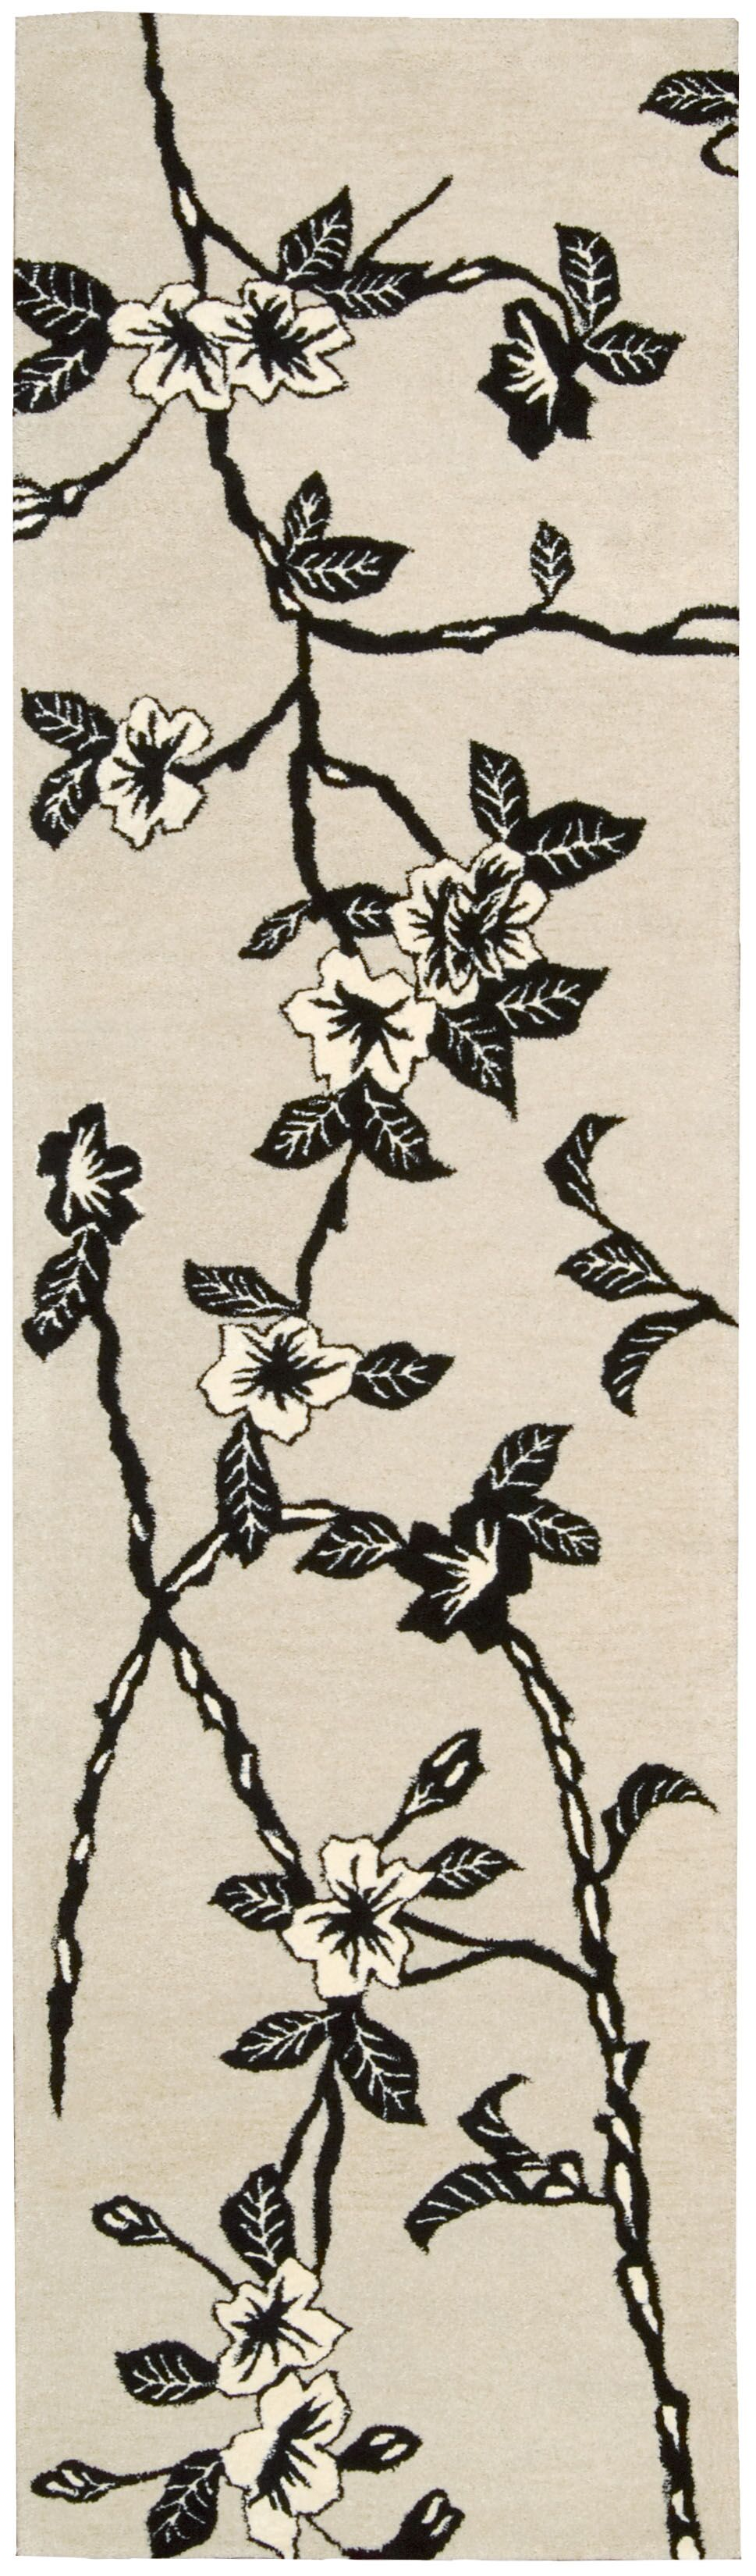 Dupoint Hand-Tufted Black/White Area Rug Rug Size: Runner 2'3